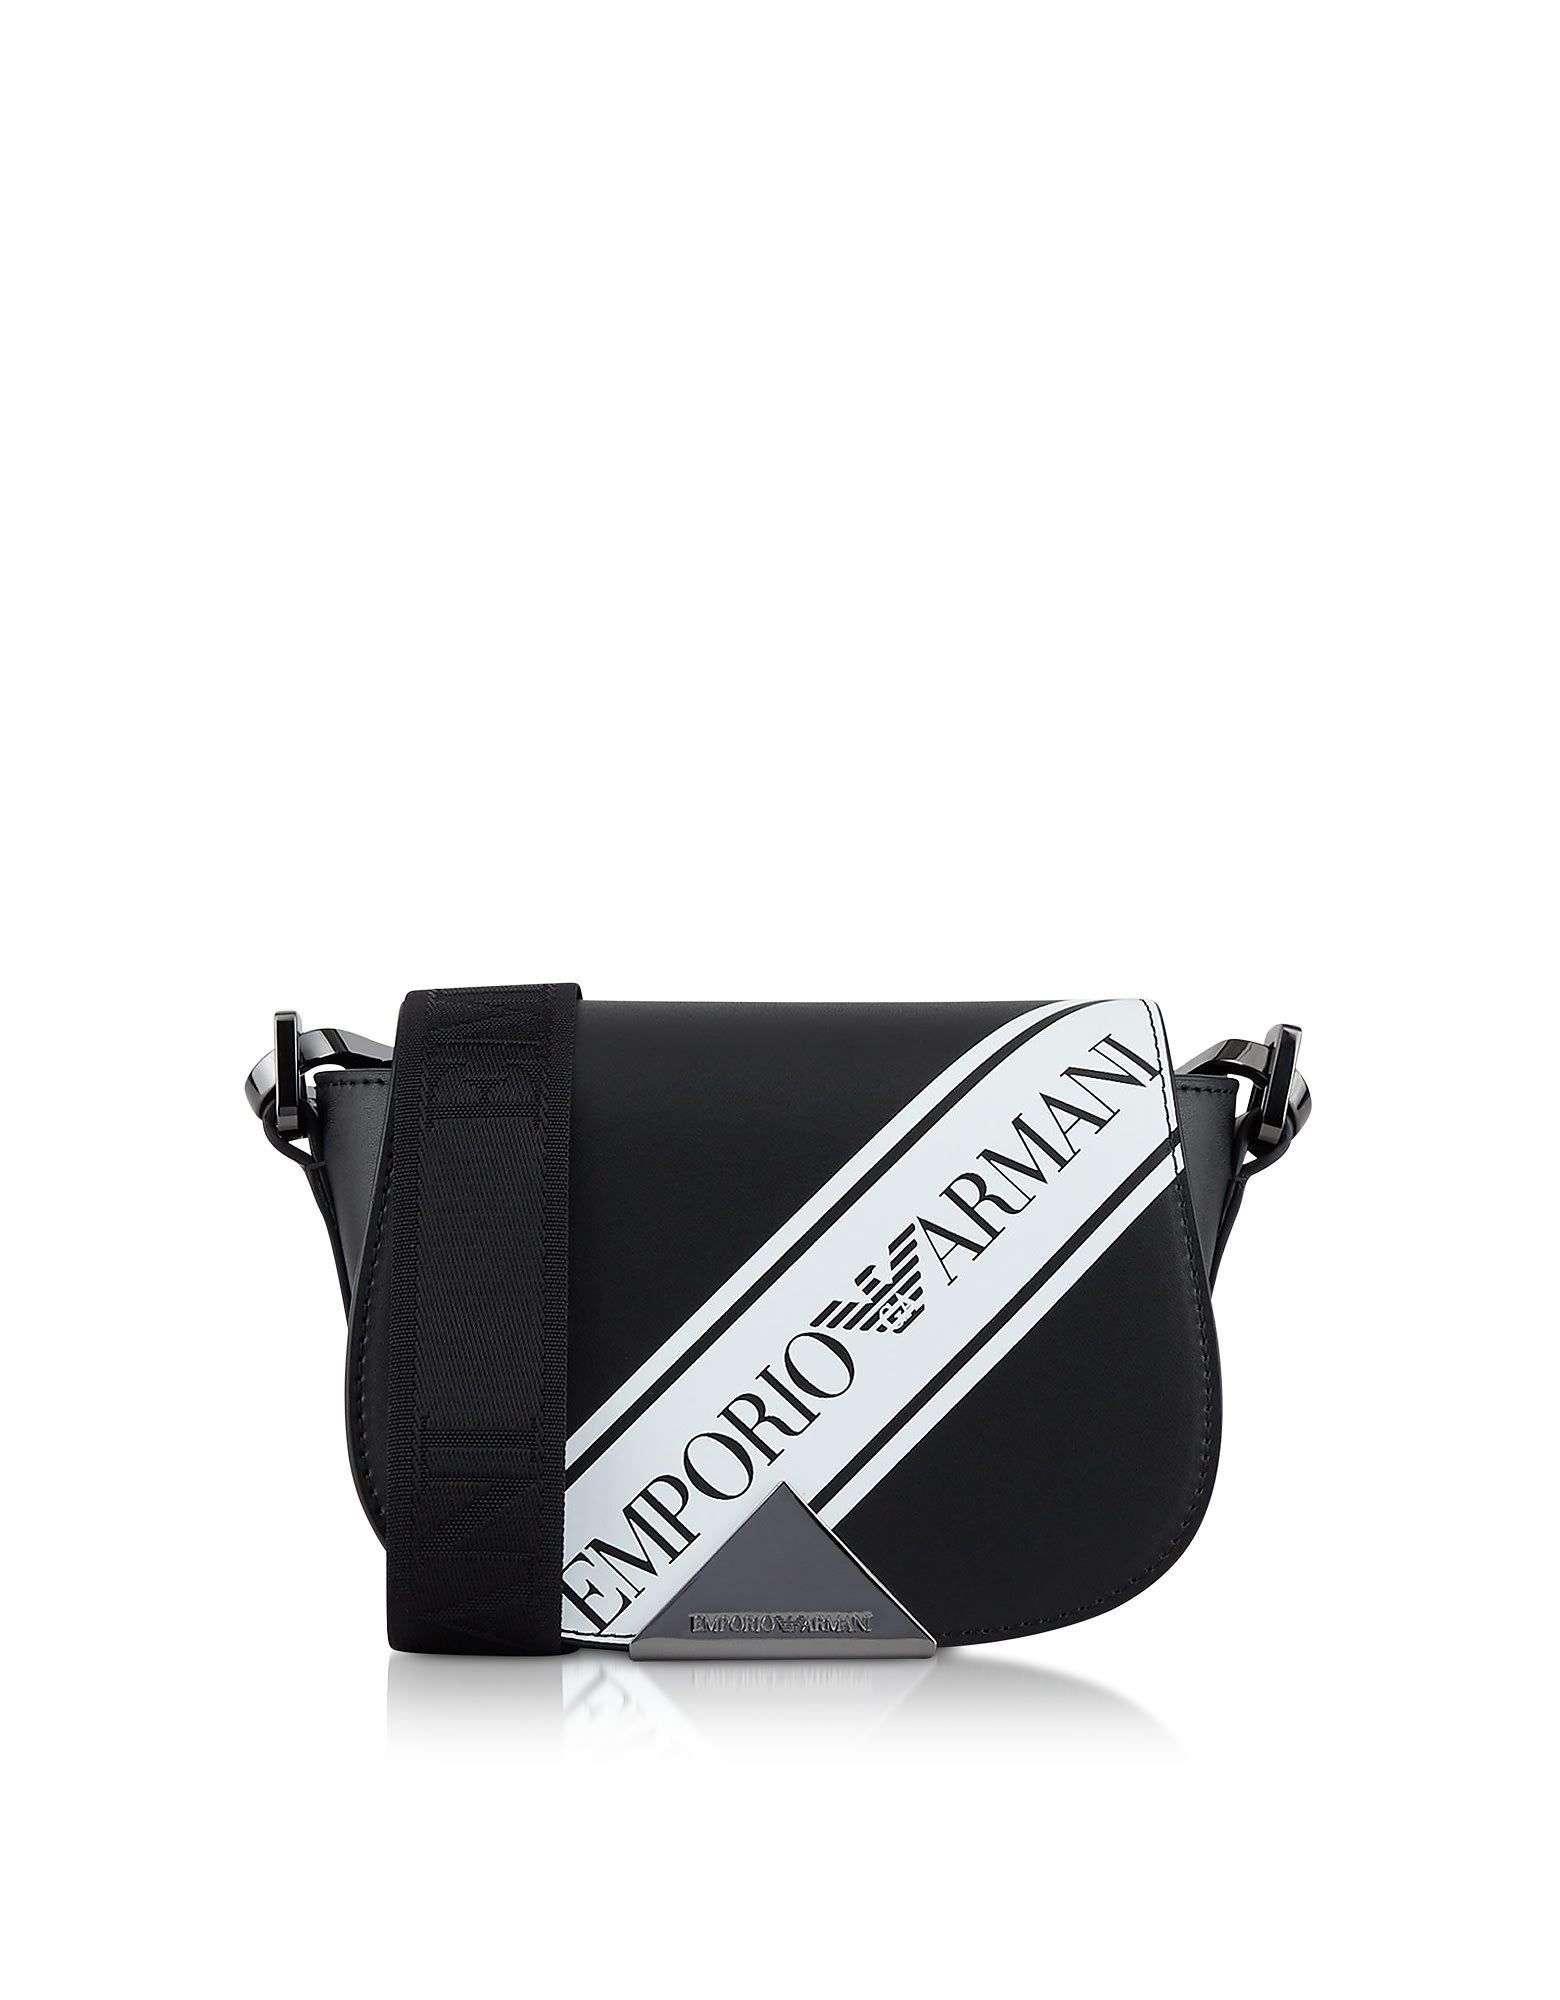 Emporio Armani Signature Shoulder Bag